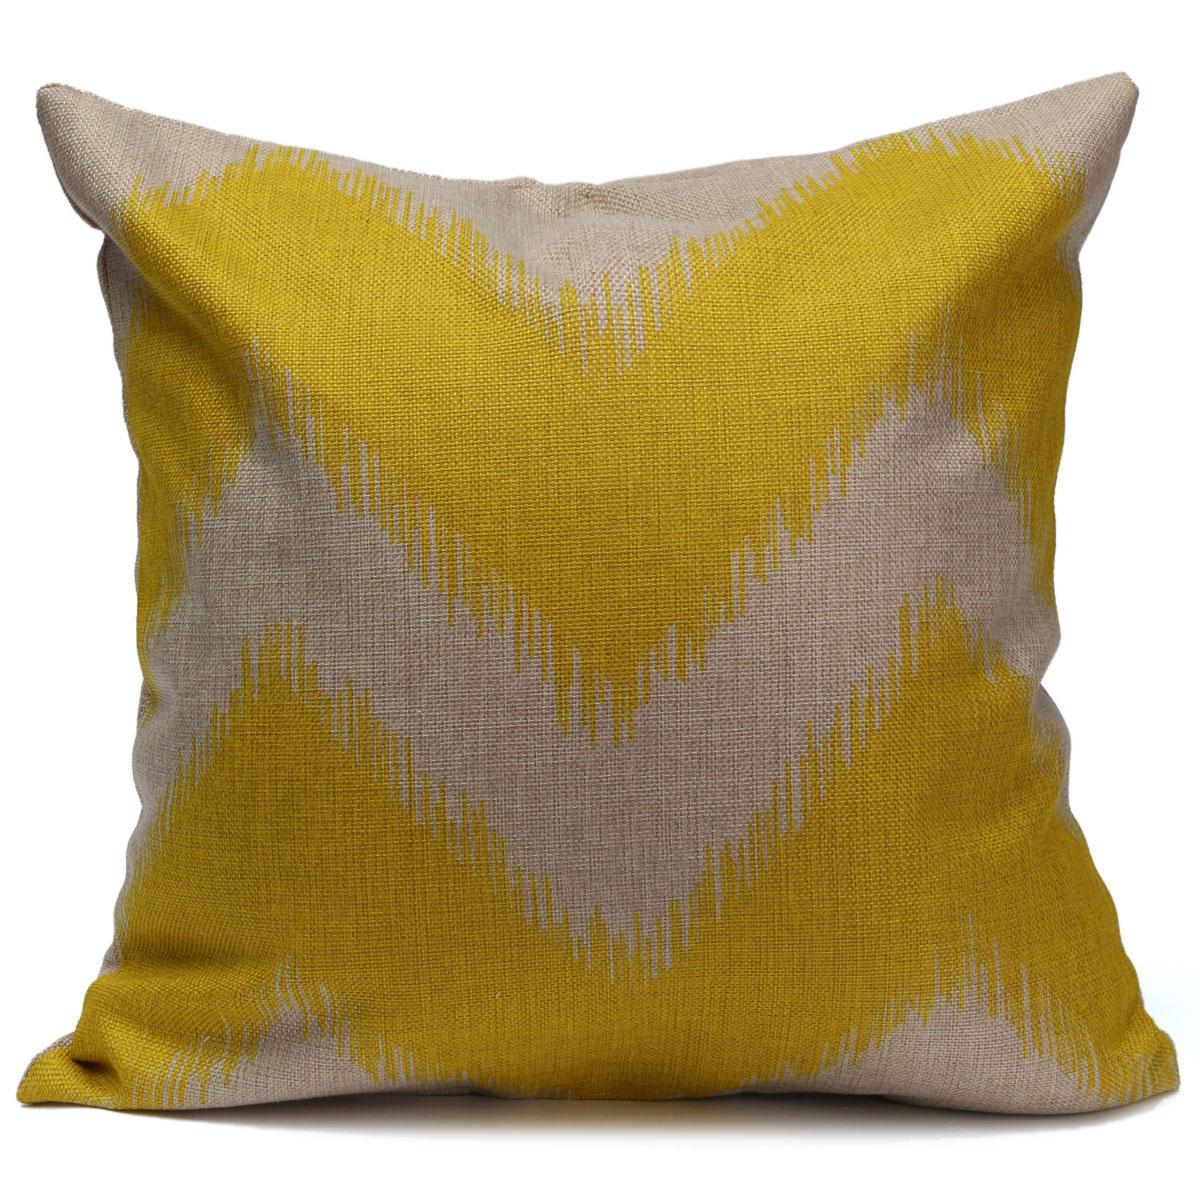 ZIG ZAG Wave Stripes Throw Pillow Case Square Cushion Cover Sofa CAR Home Decor eBay